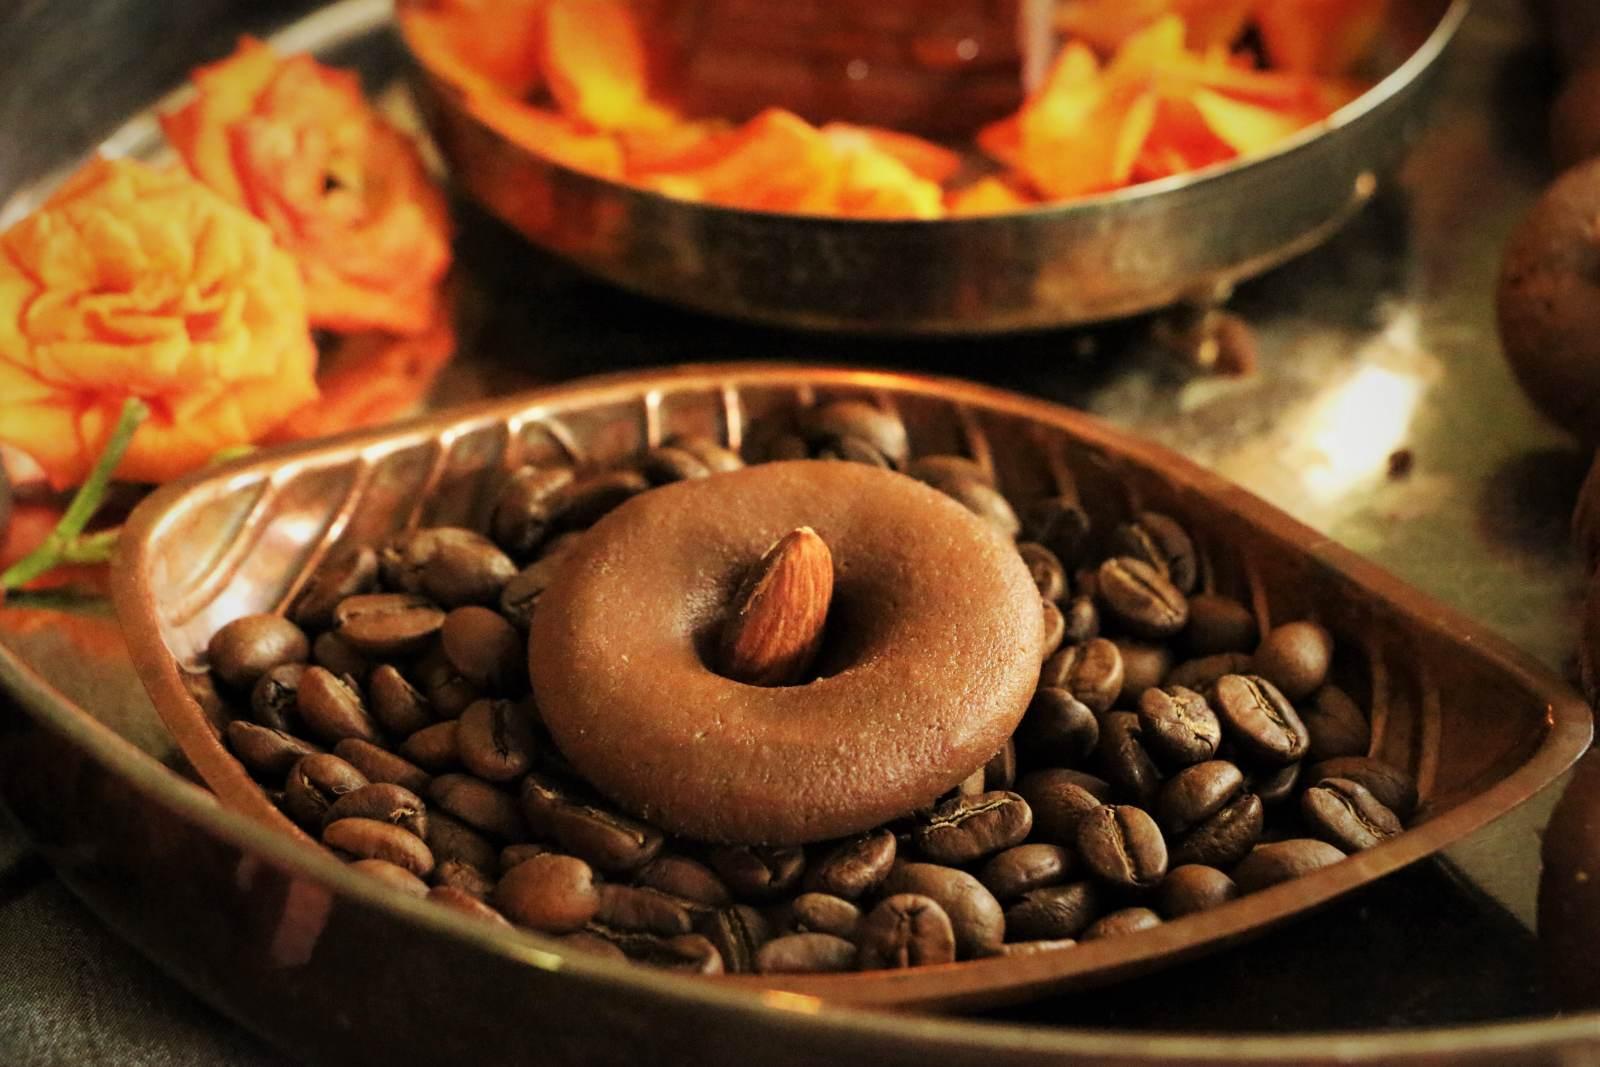 Filter coffee choco peda recipe microwave method by archanas kitchen filter coffee choco peda recipe microwave method forumfinder Choice Image